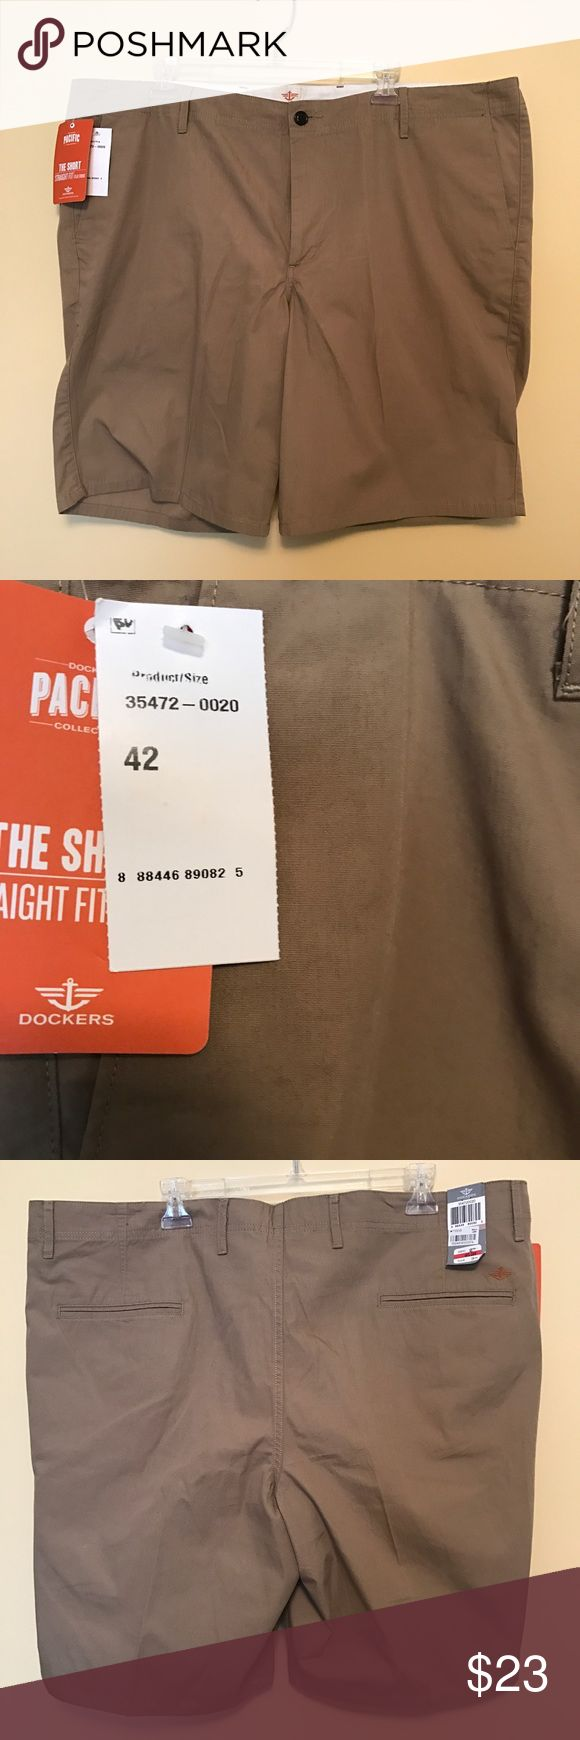 Docker men's dress shorts Tan dress shorts NWT Dockers Shorts